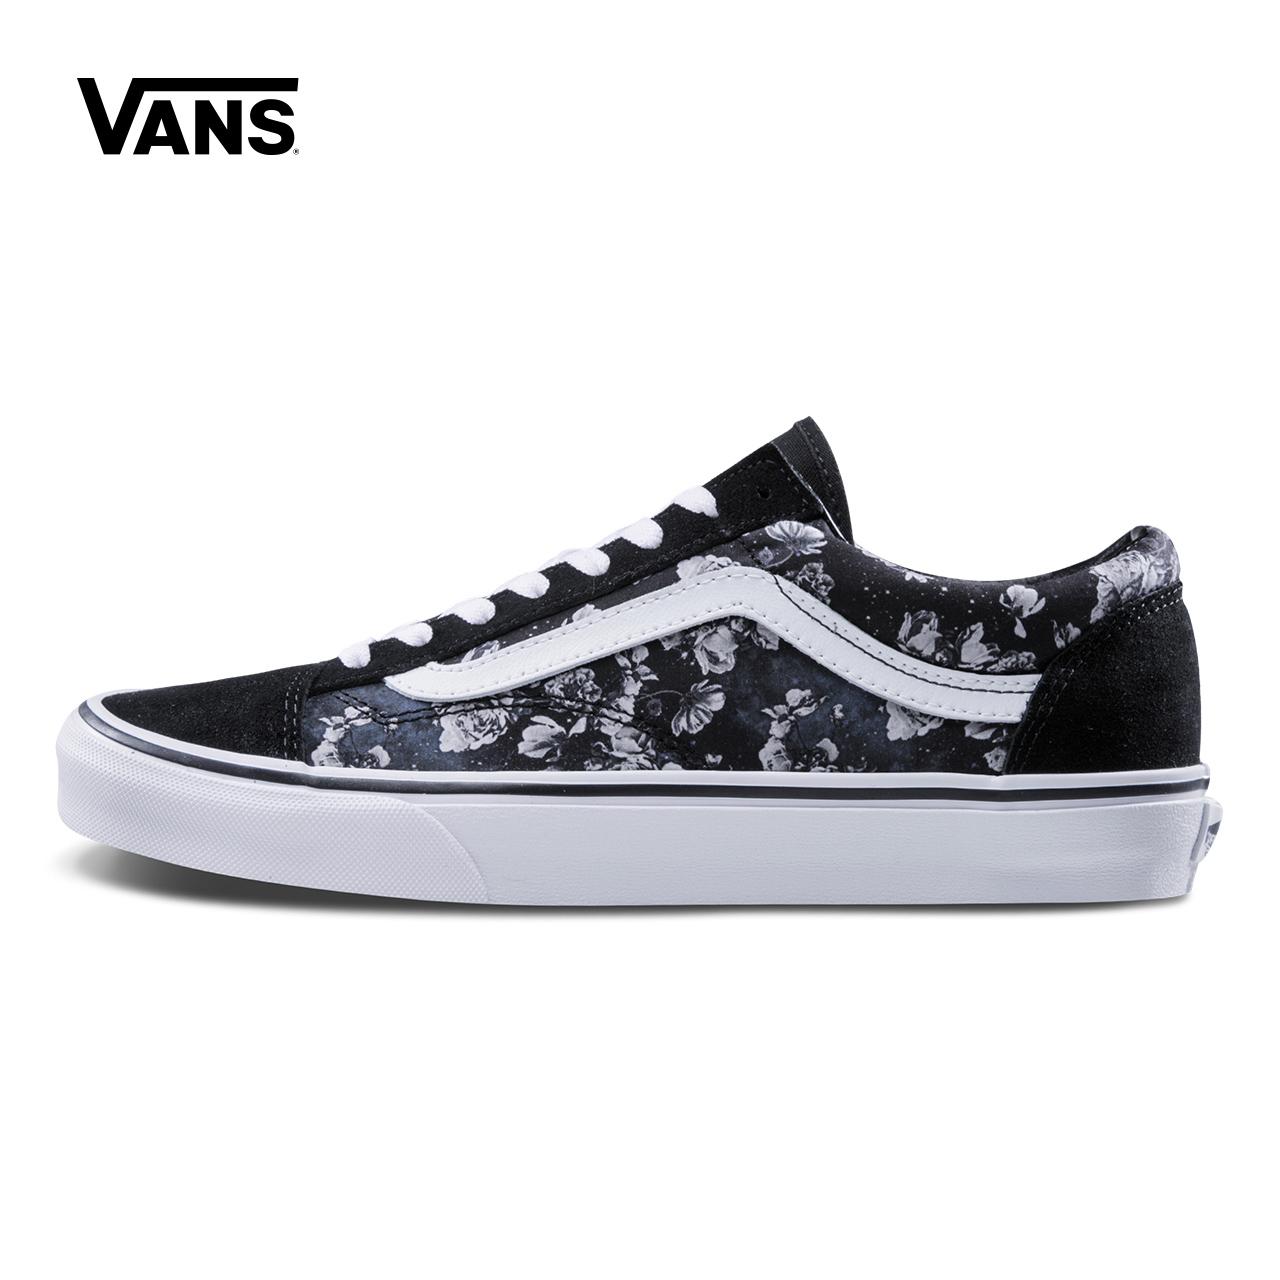 Vans 范斯官方男女款STYLE 36板鞋|VN0A3DZ3HTM